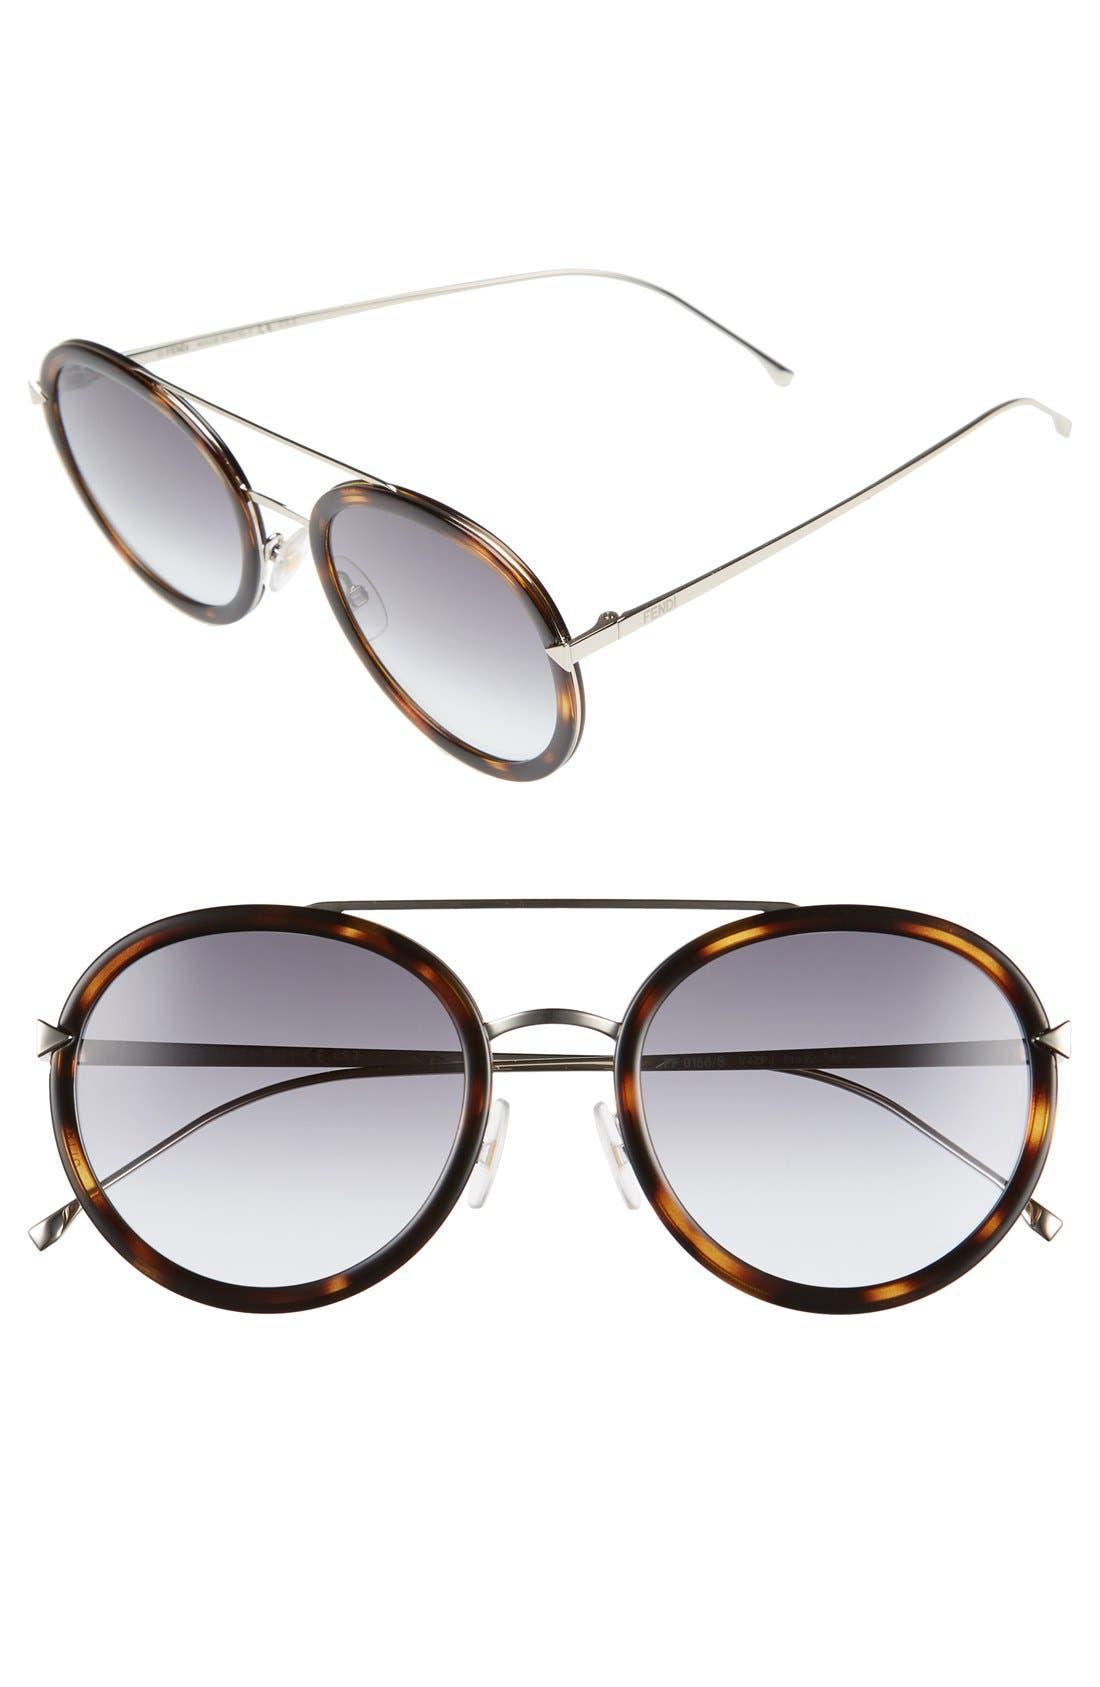 51mm Round Aviator Sunglasses,                         Main,                         color, HAVANA/ GOLD